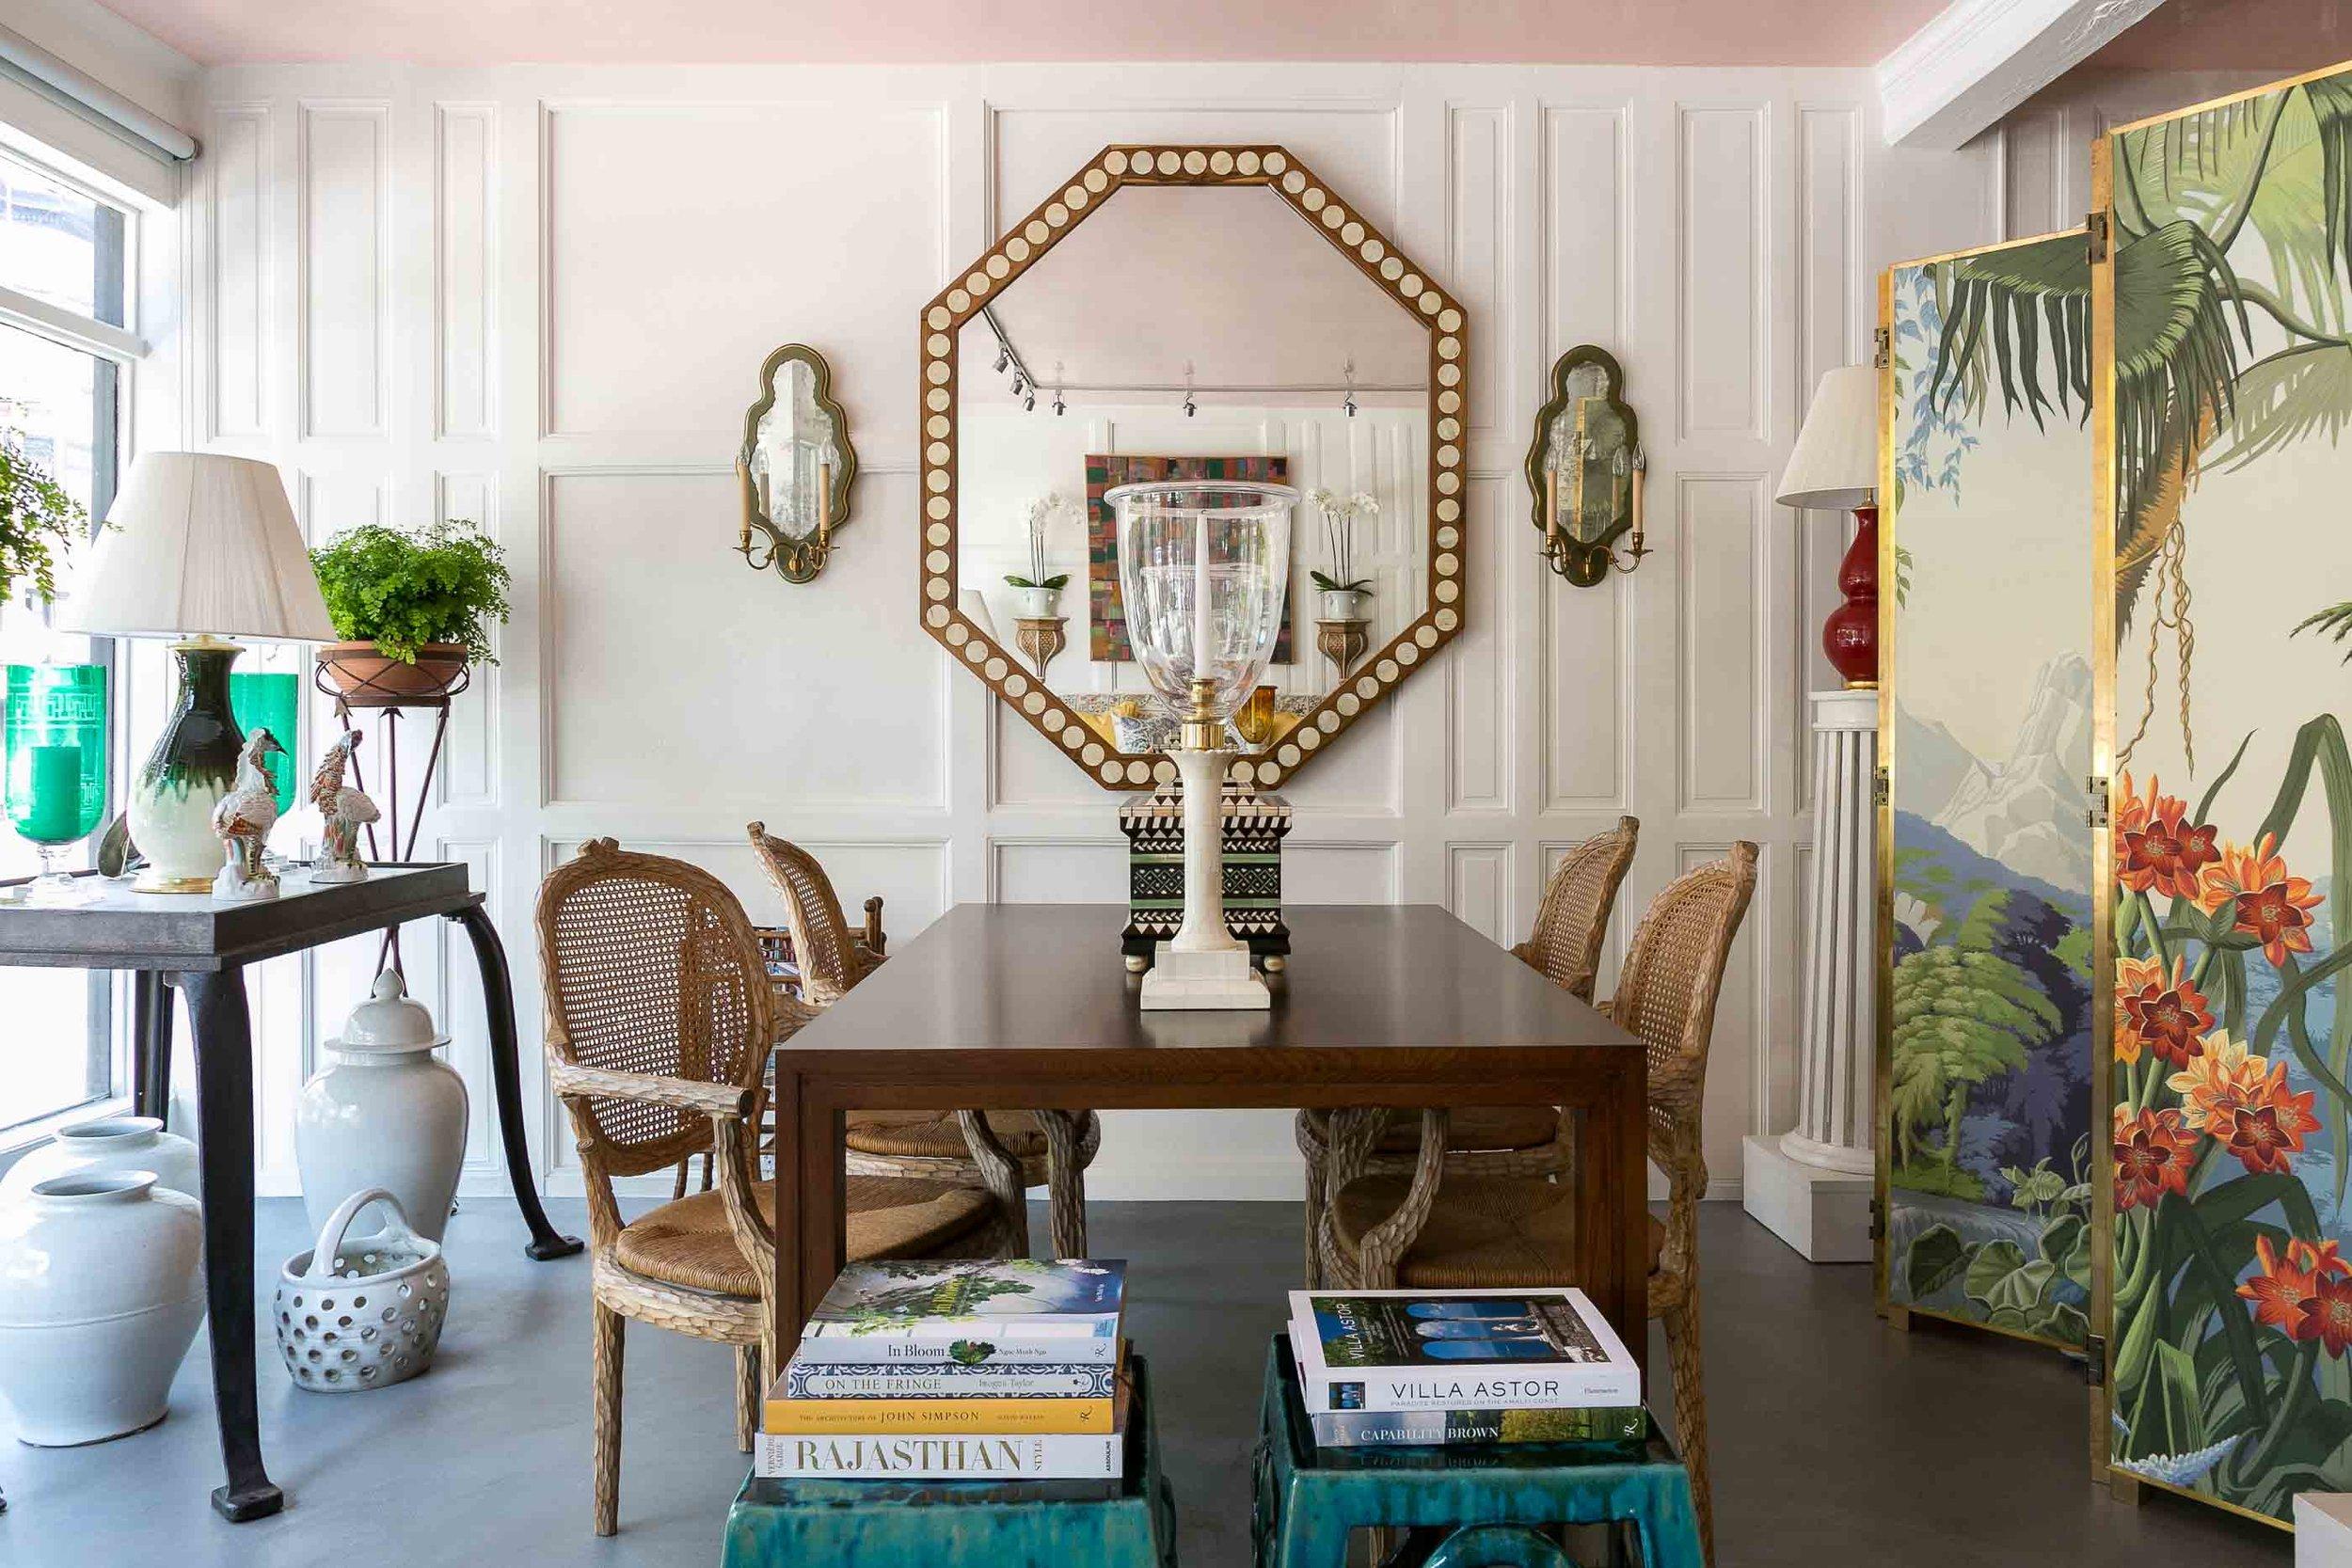 Allison-Caccoma-Decoration--5.jpg